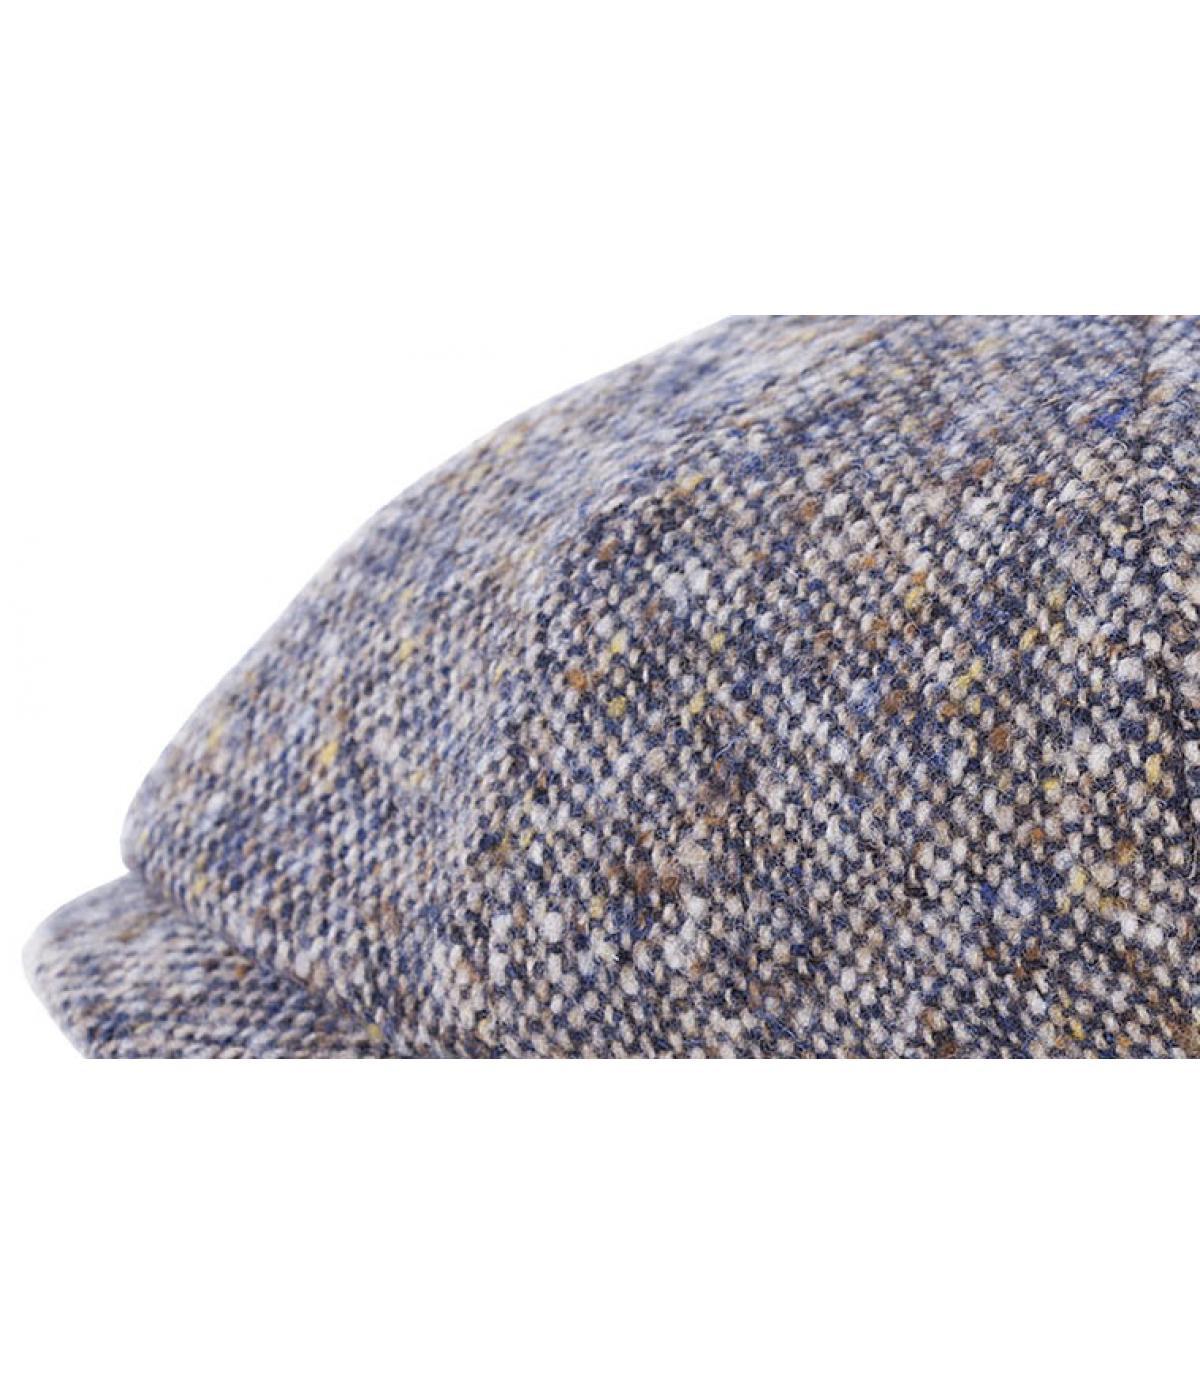 Detalles Hatteras donegal laine azul imagen 1